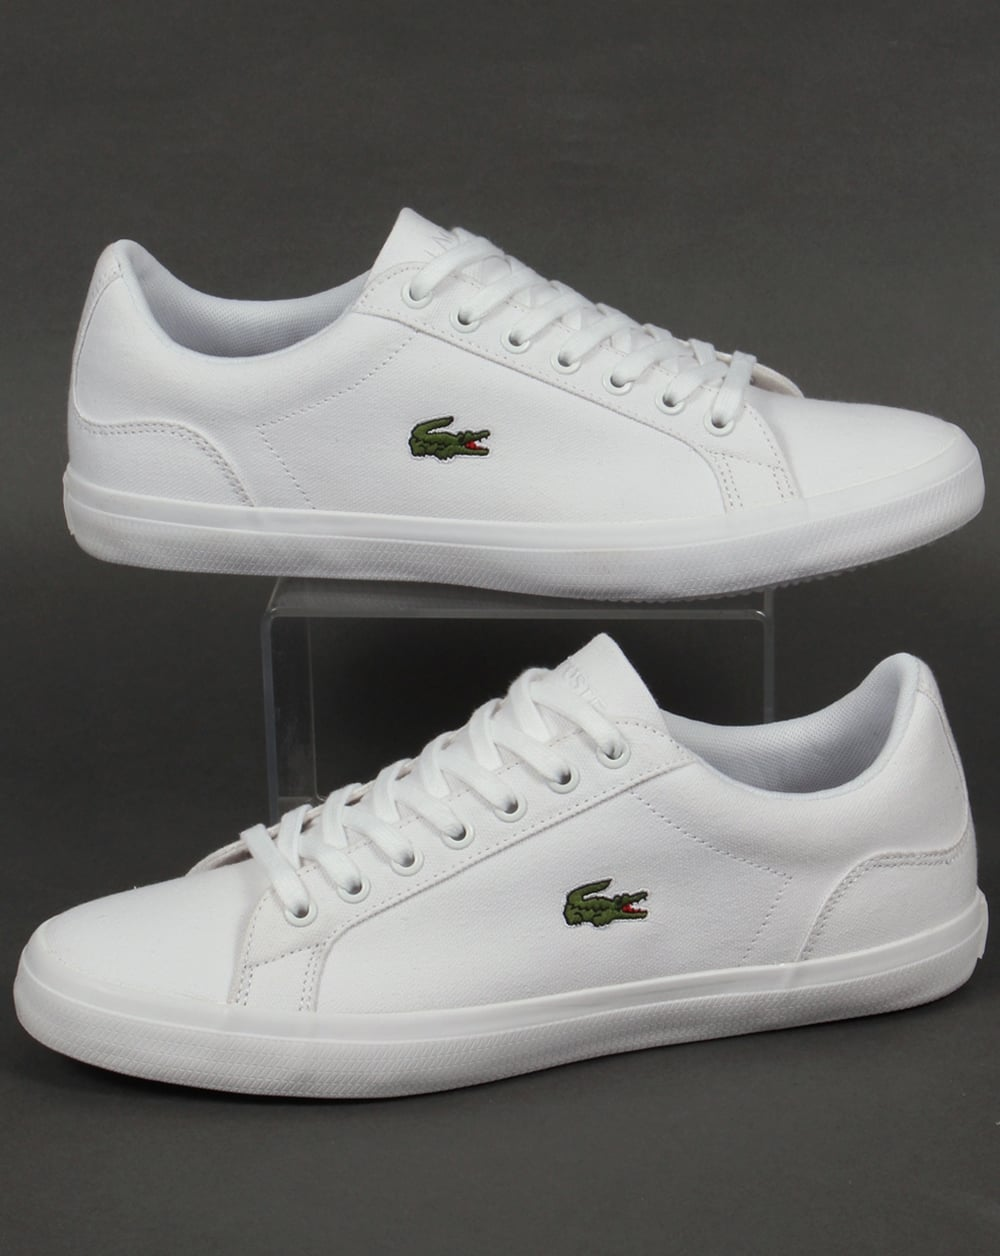 9441256abd0041 Lacoste Lacoste Lerond Canvas Trainers White